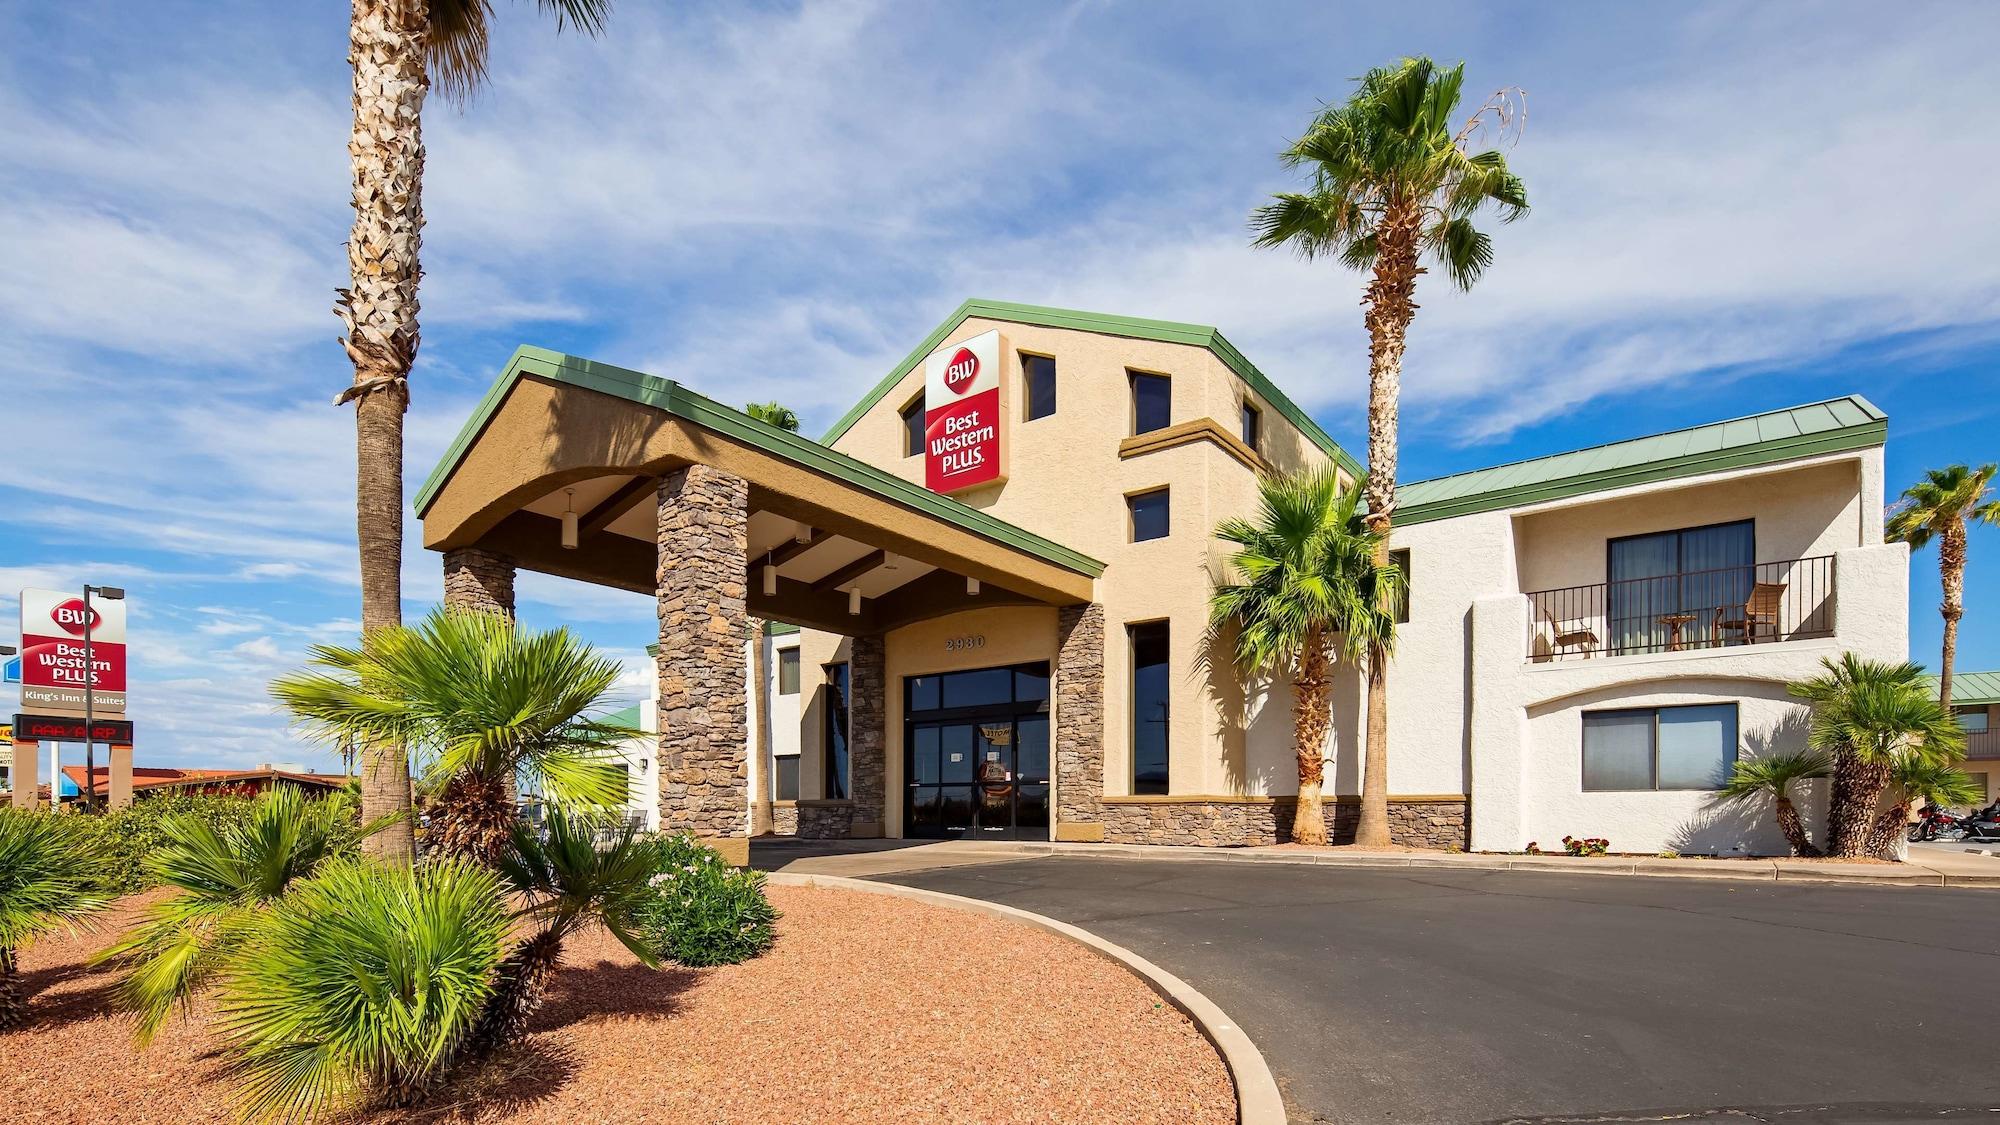 Best Western Plus King's Inn & Suites, Mohave